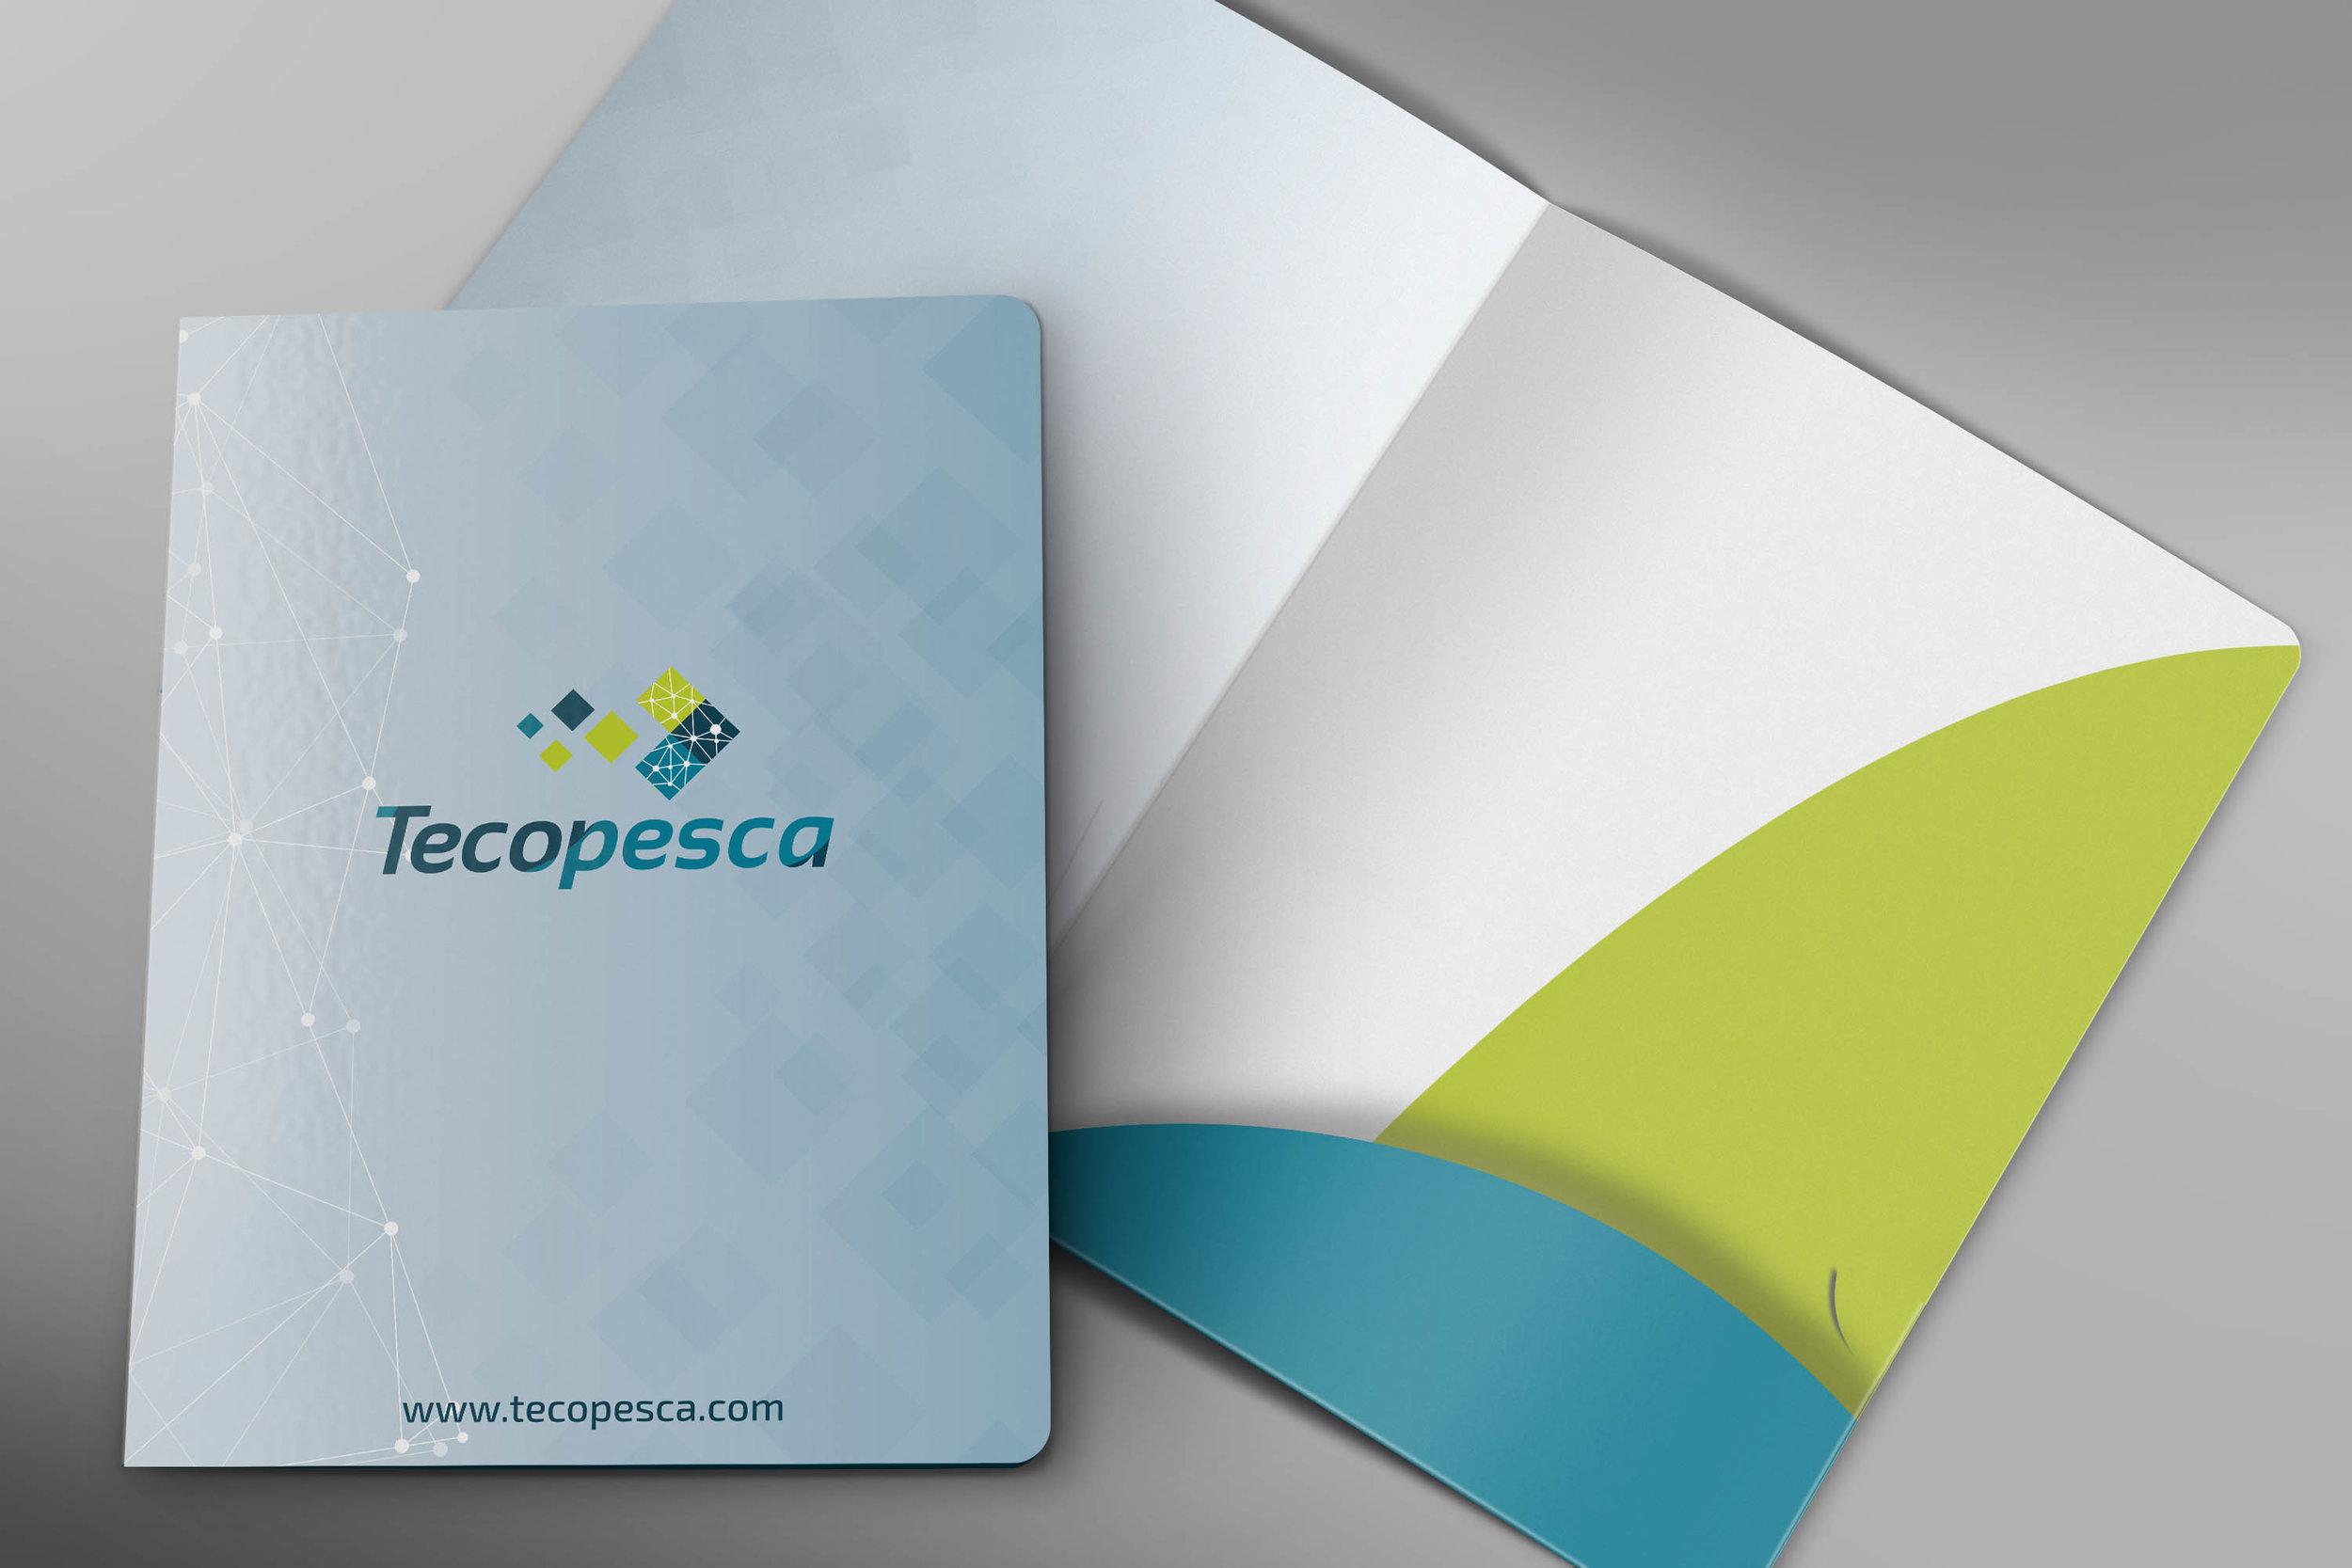 Carpeta tecopesca.jpg